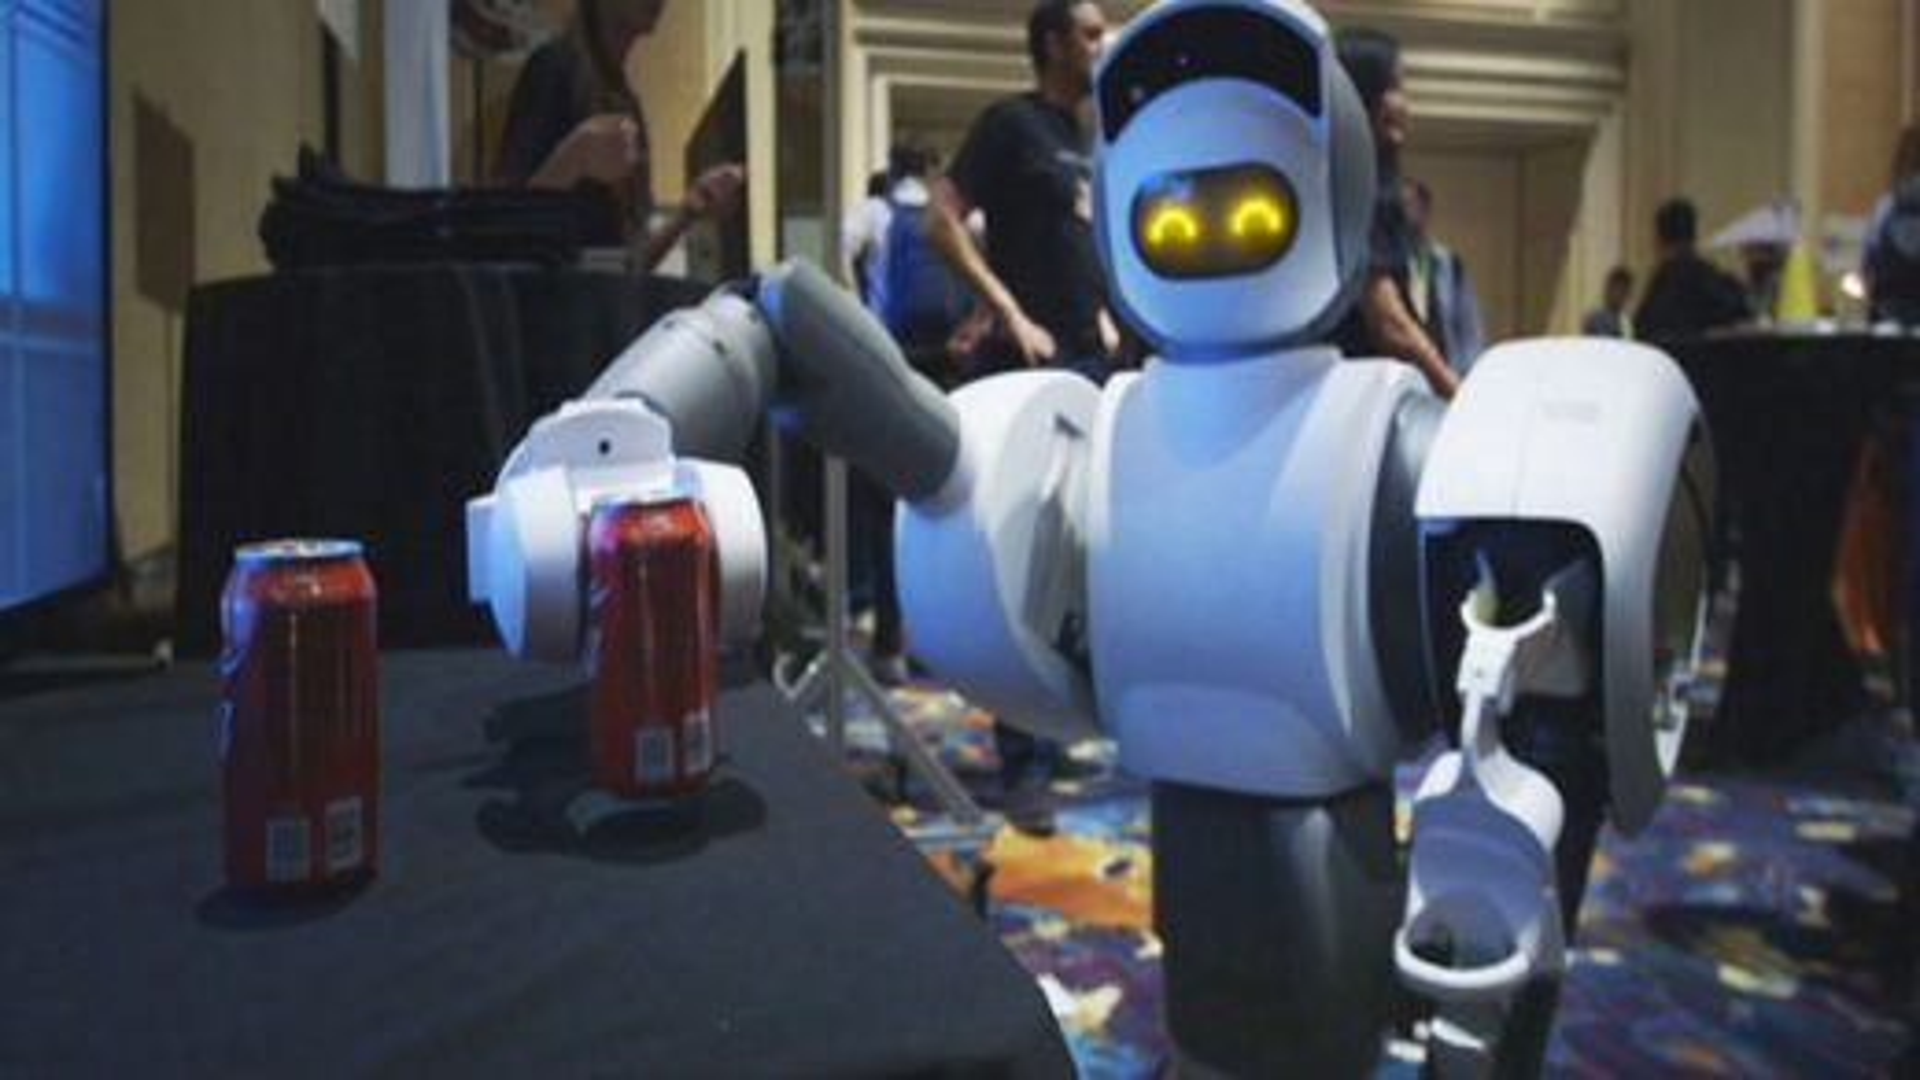 ربات-پیشرفته | تگ